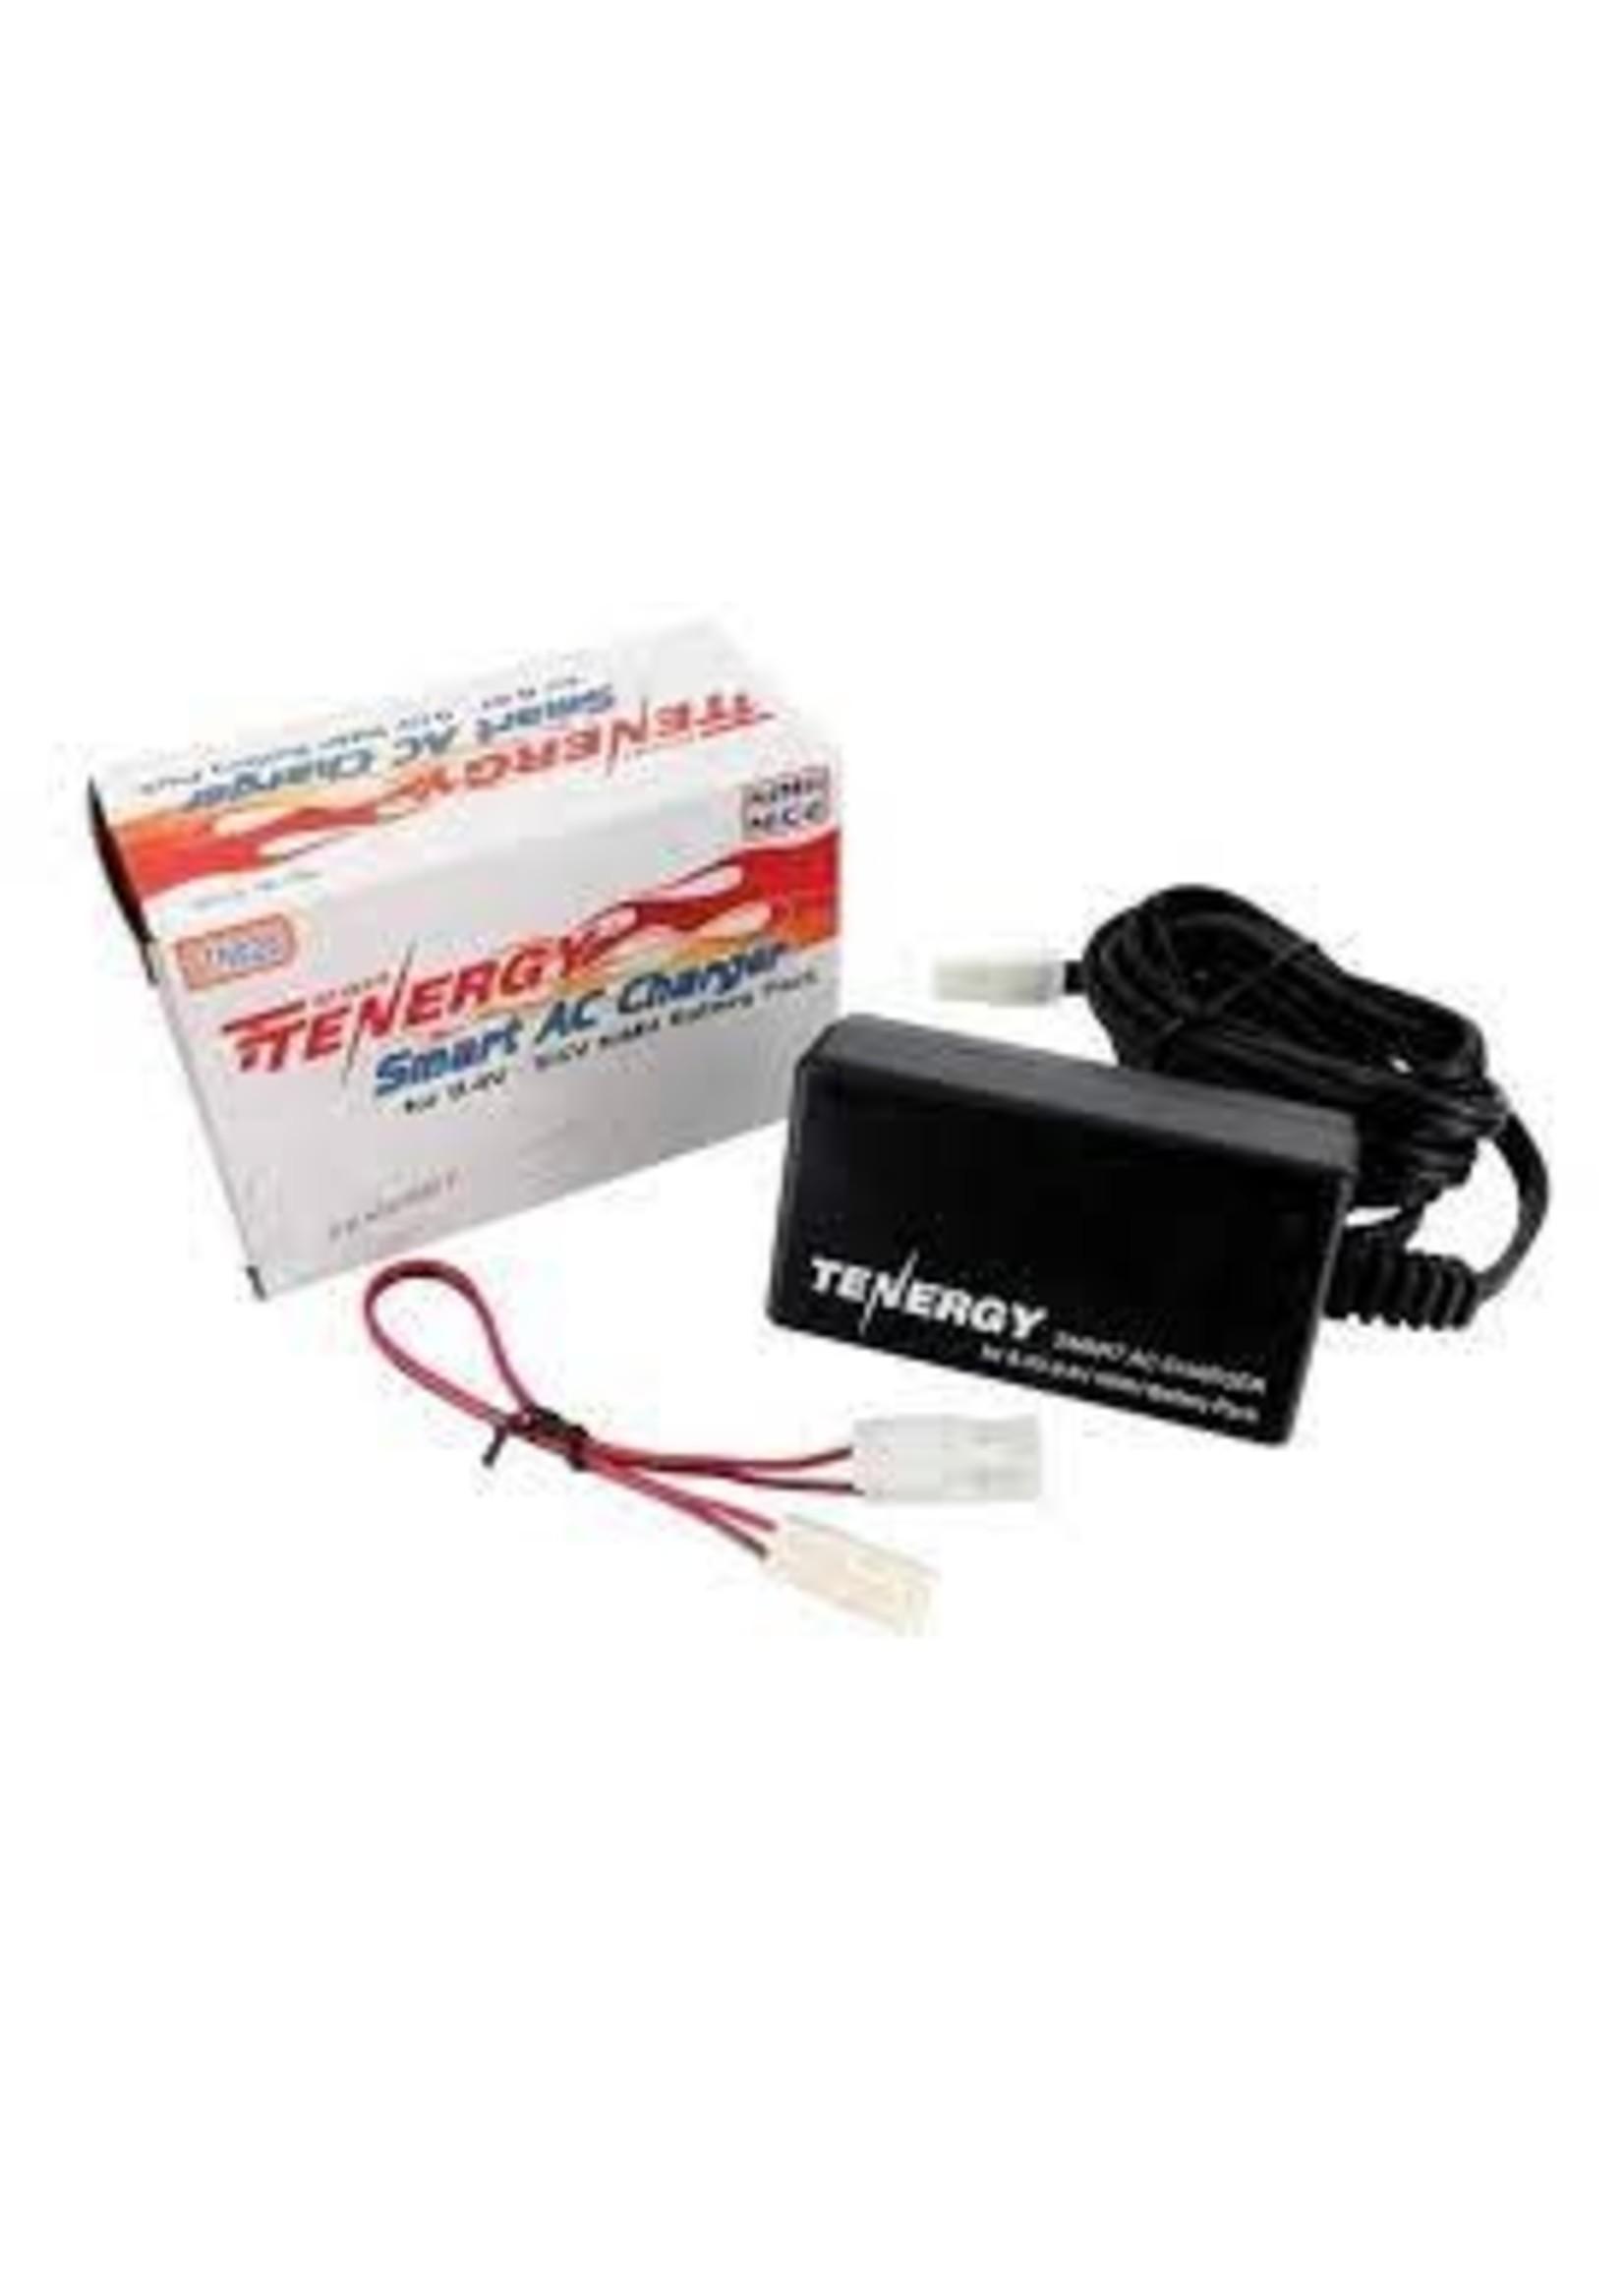 TENERGY 01026 / Tenergy Smart Universal Charger - for NiMH/NiCd Battery pack 7-8S 8.4V-9.6V 600mA